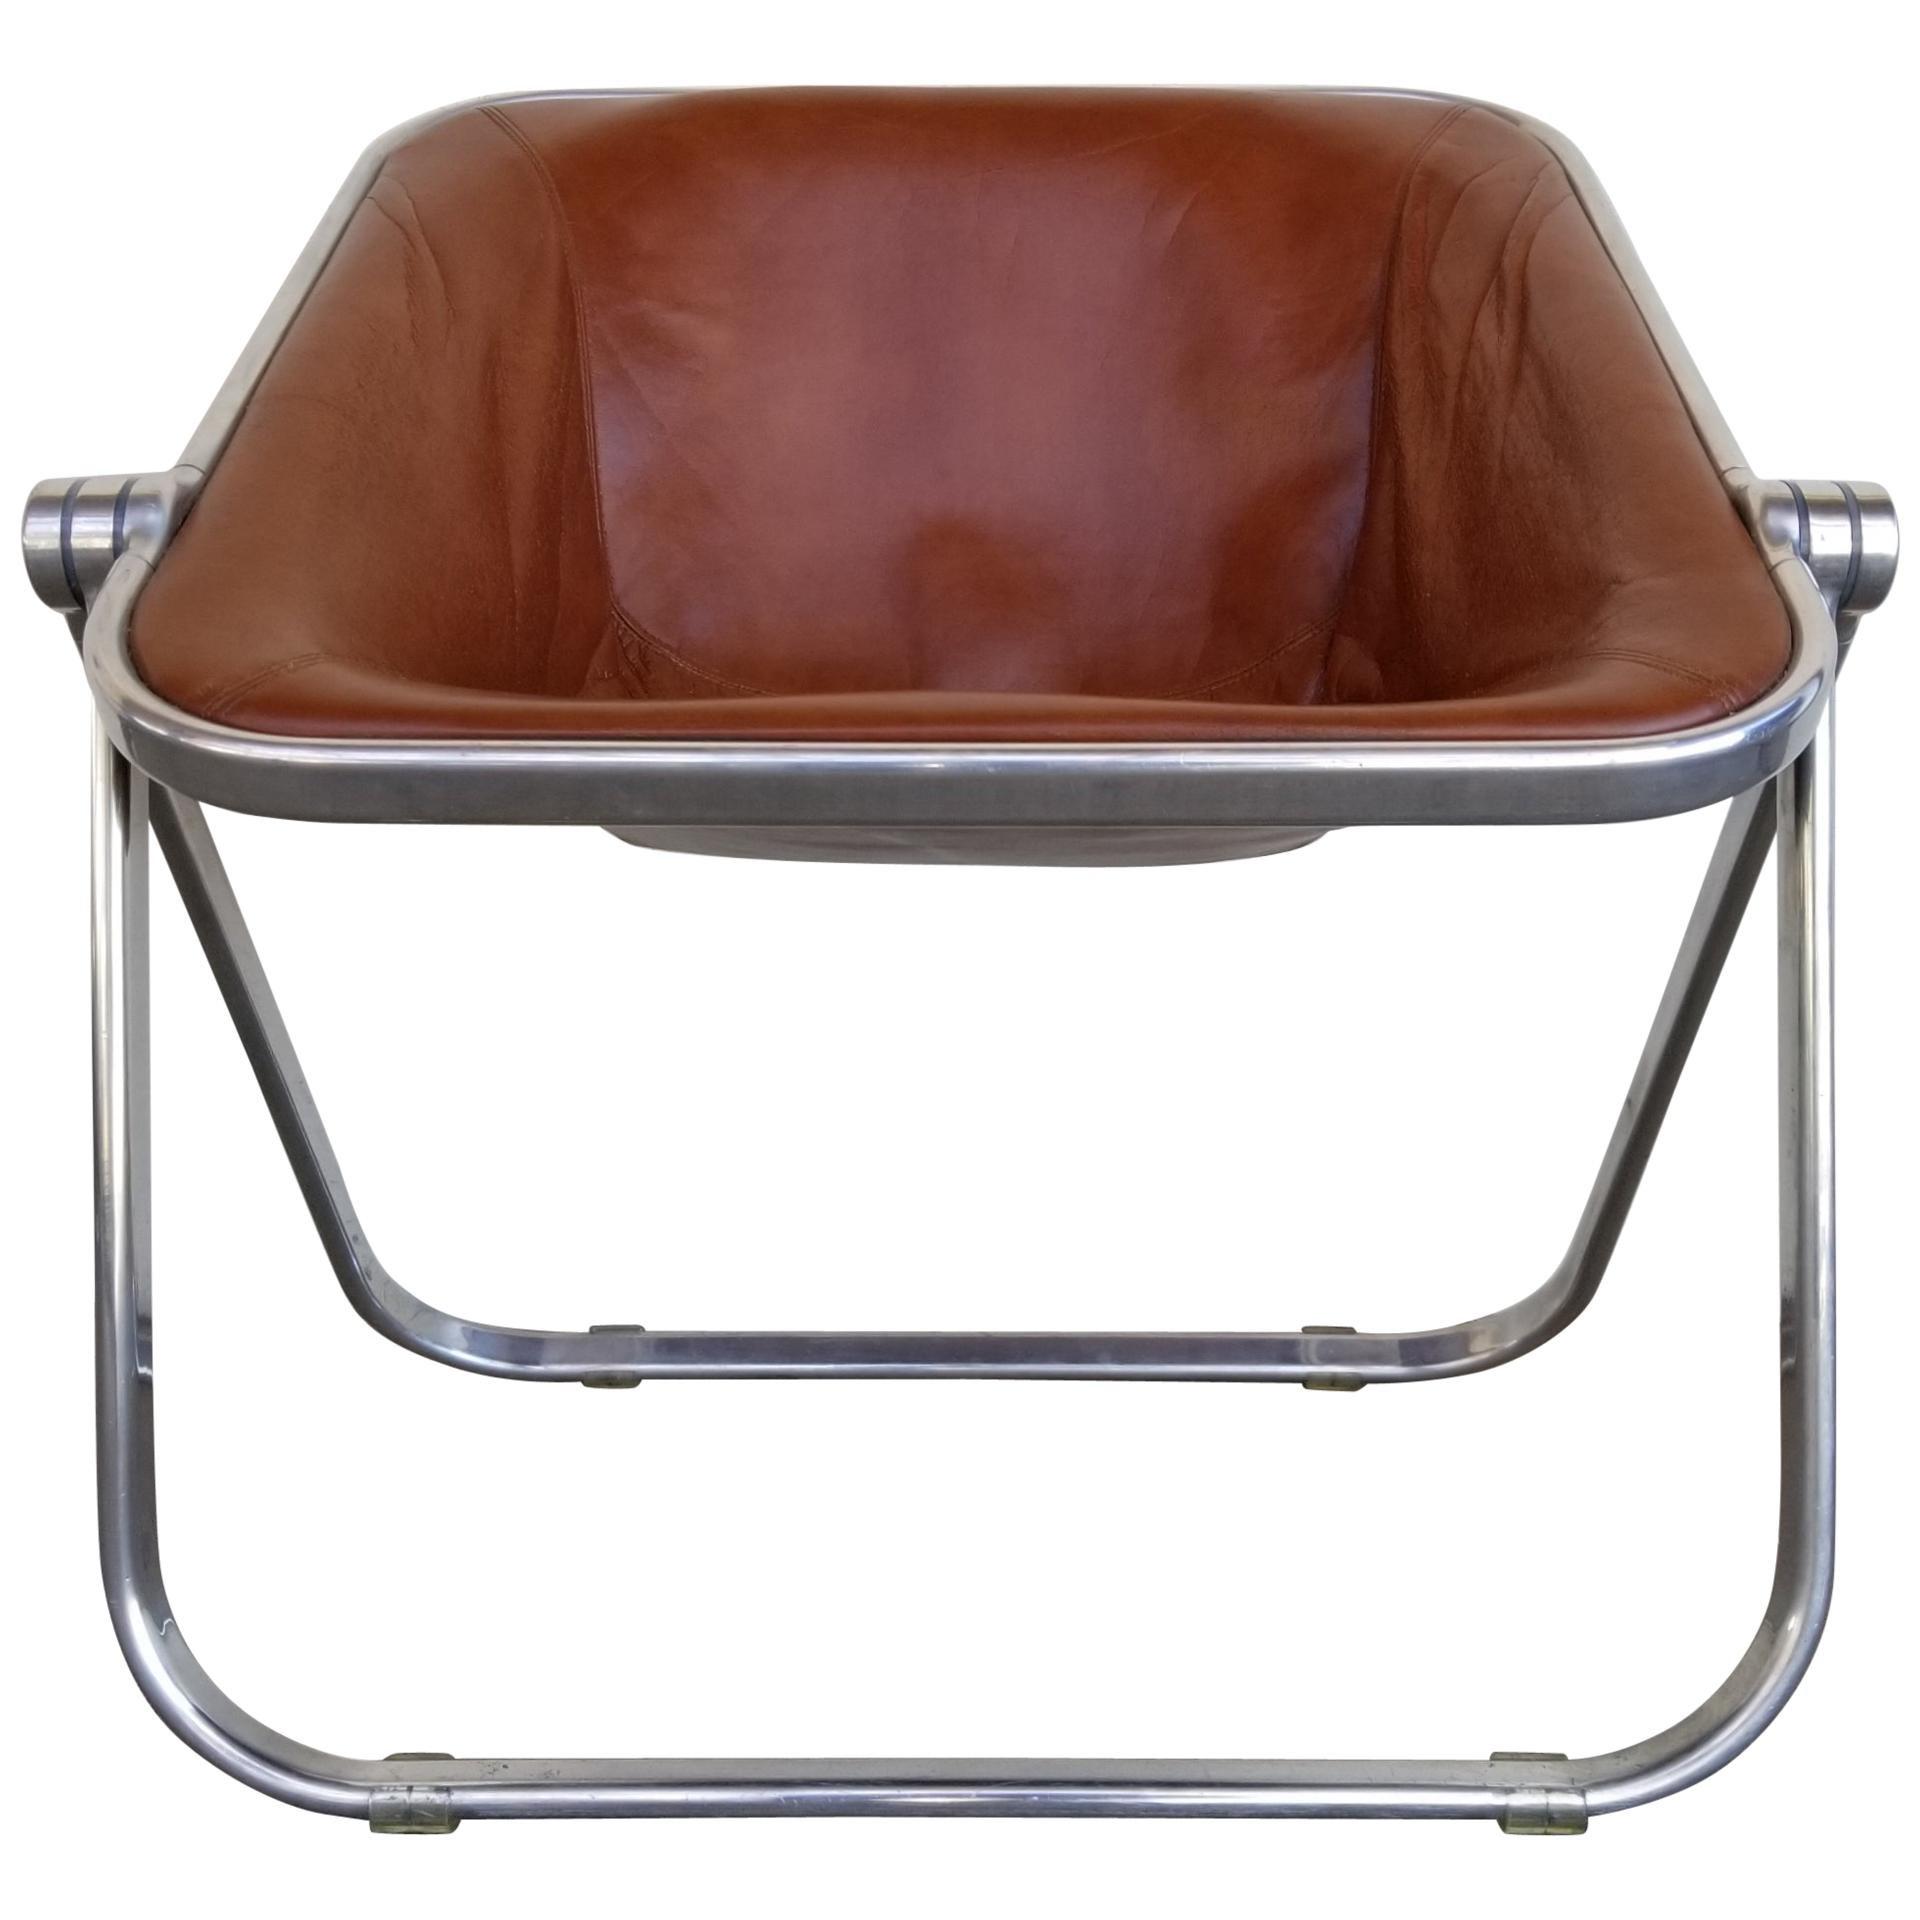 Giancarlo Piretti for Castelli Plona Leather & Chrome Folding Chair